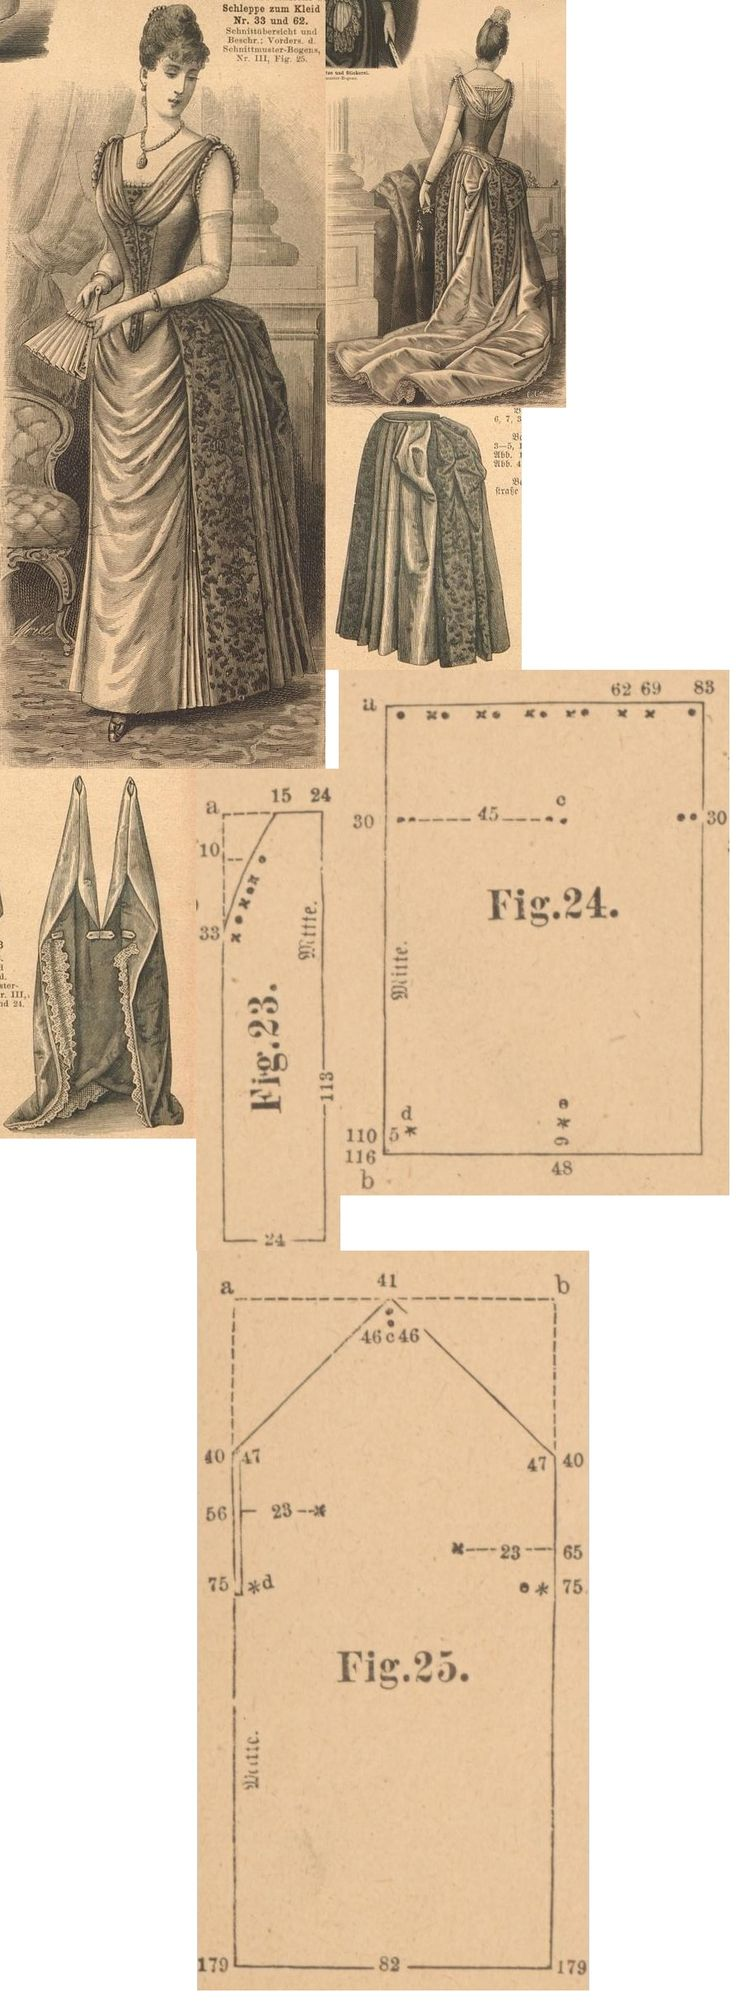 Der Bazar 1889: Dim pink atlas and similar toned damast frisé ball dress with detachable train; 23. and 24. skirt's gores, 25. train's part